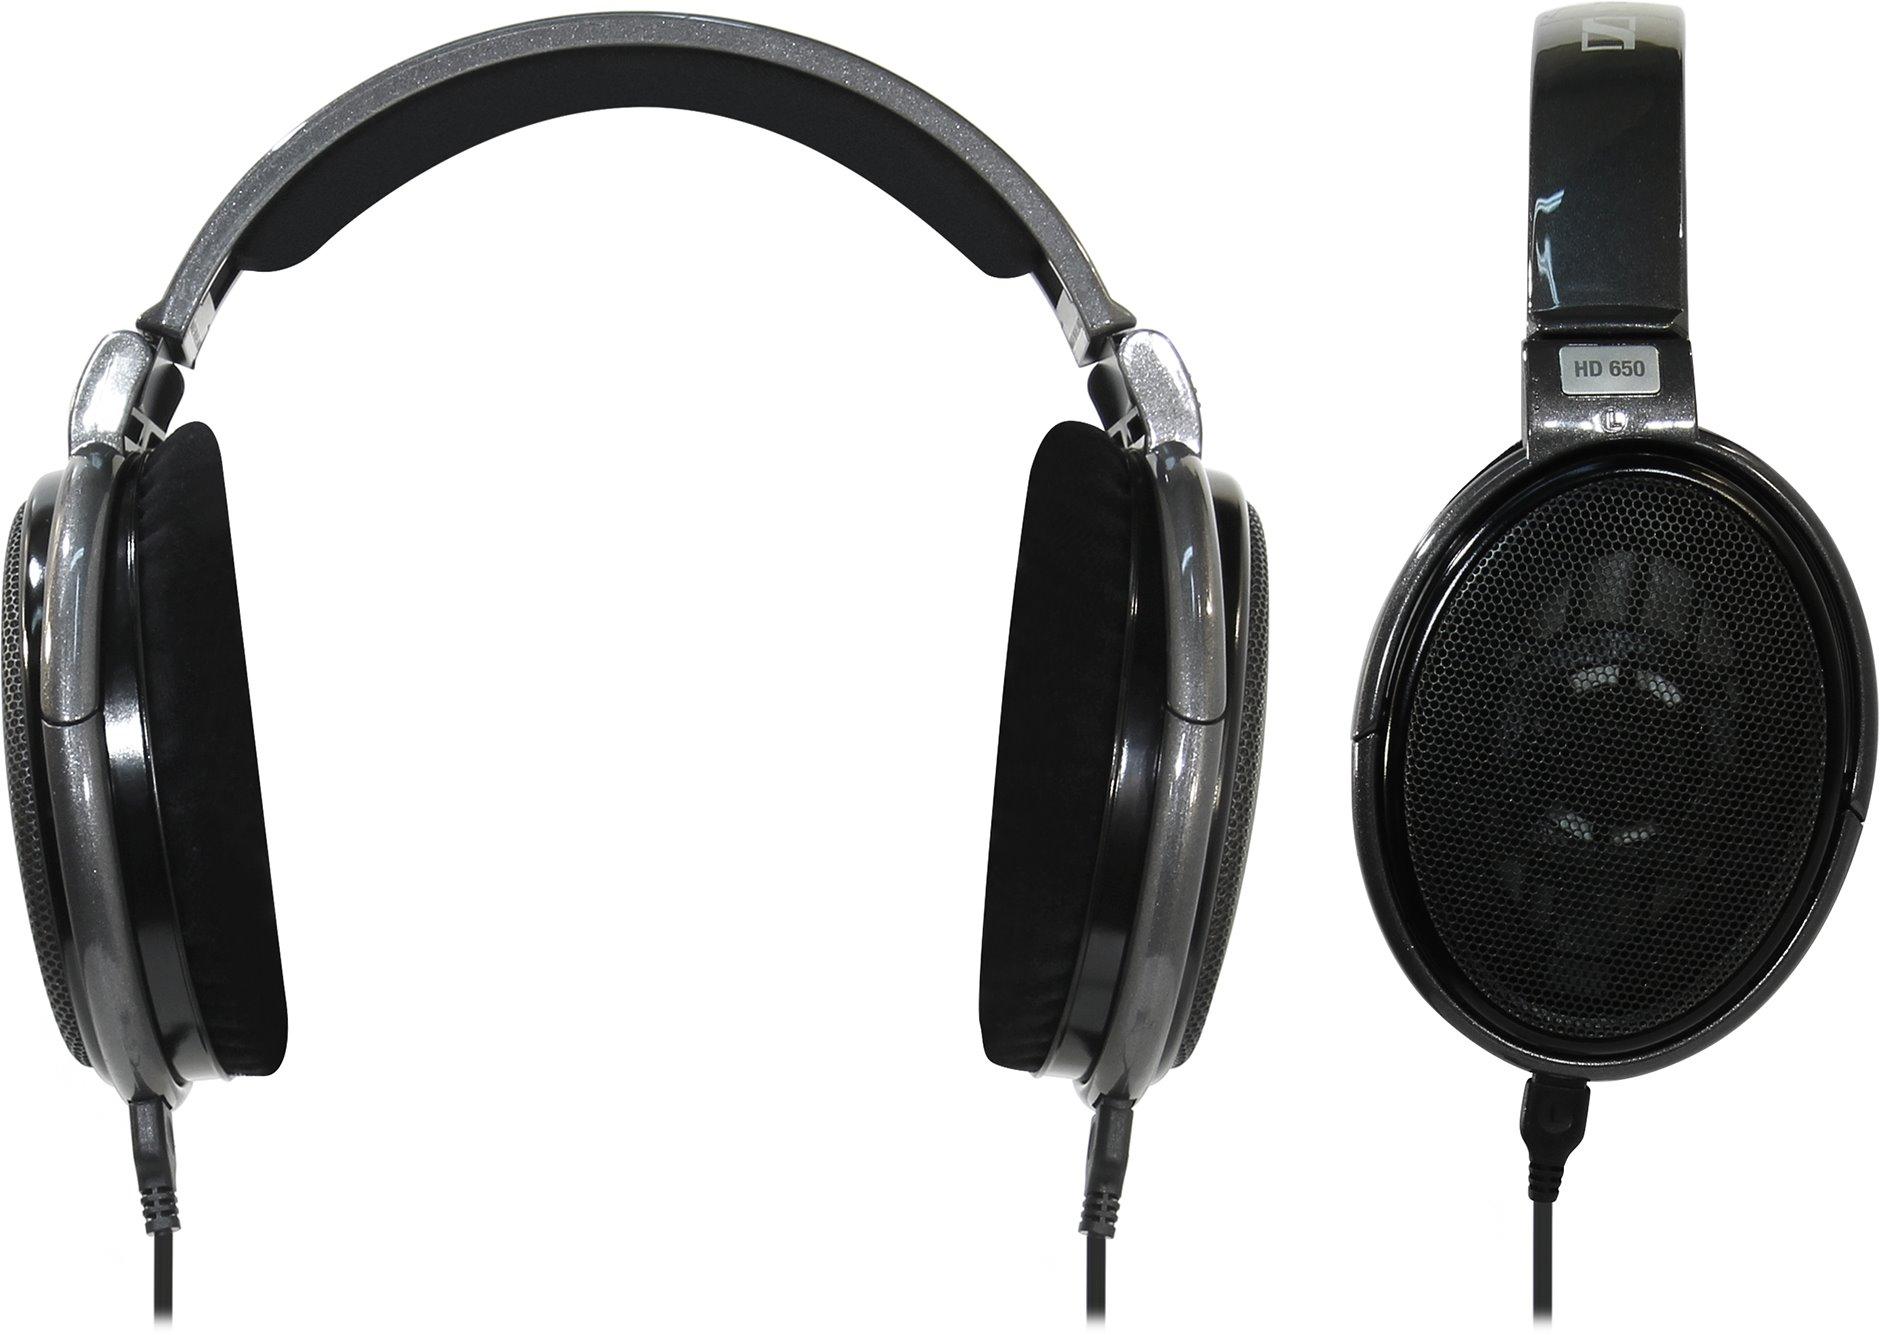 Проводные наушники Sennheiser HD 650, jack 6.3 mm, серый